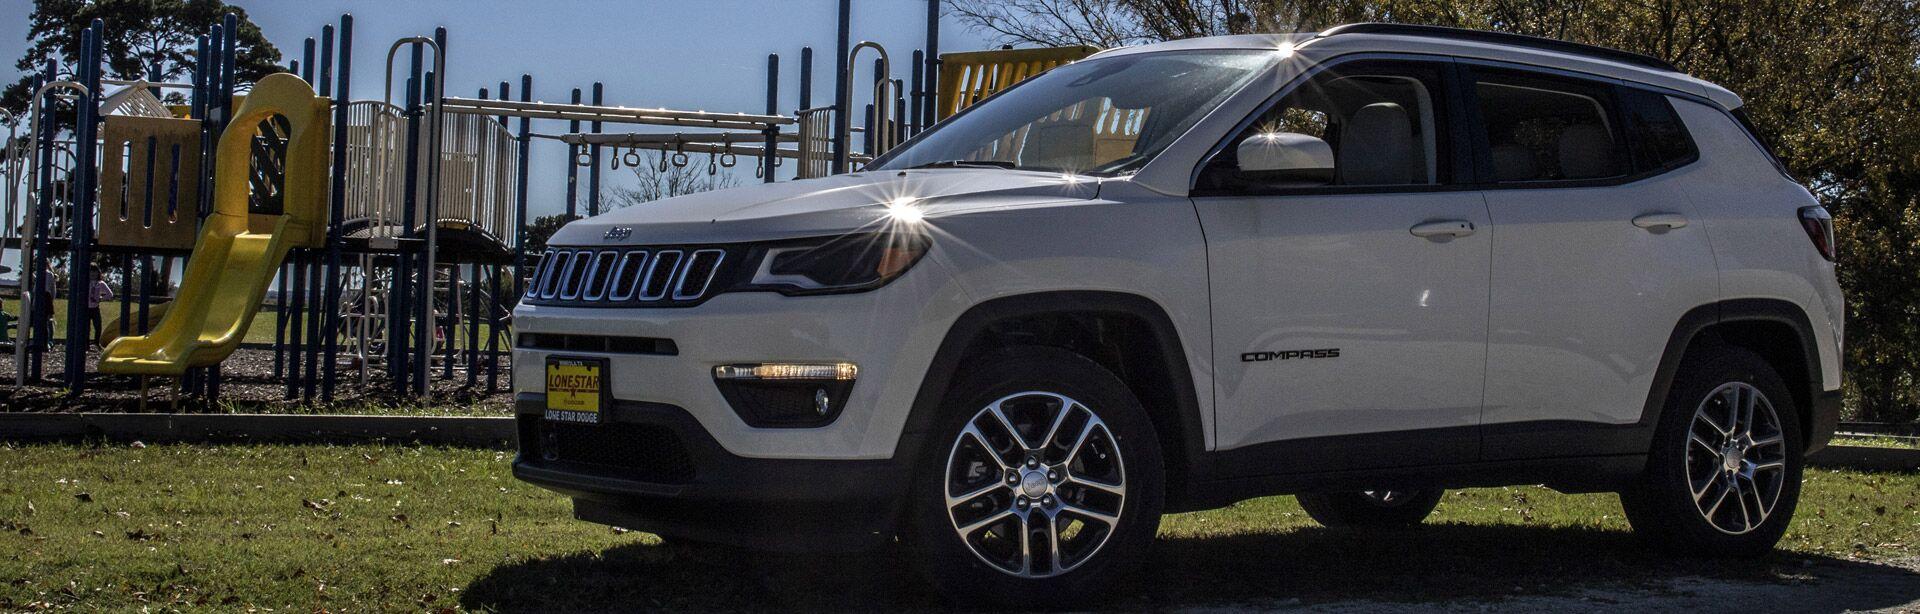 Chrysler Dodge Jeep Ram Dealership Mineola Tx Used Cars Lone